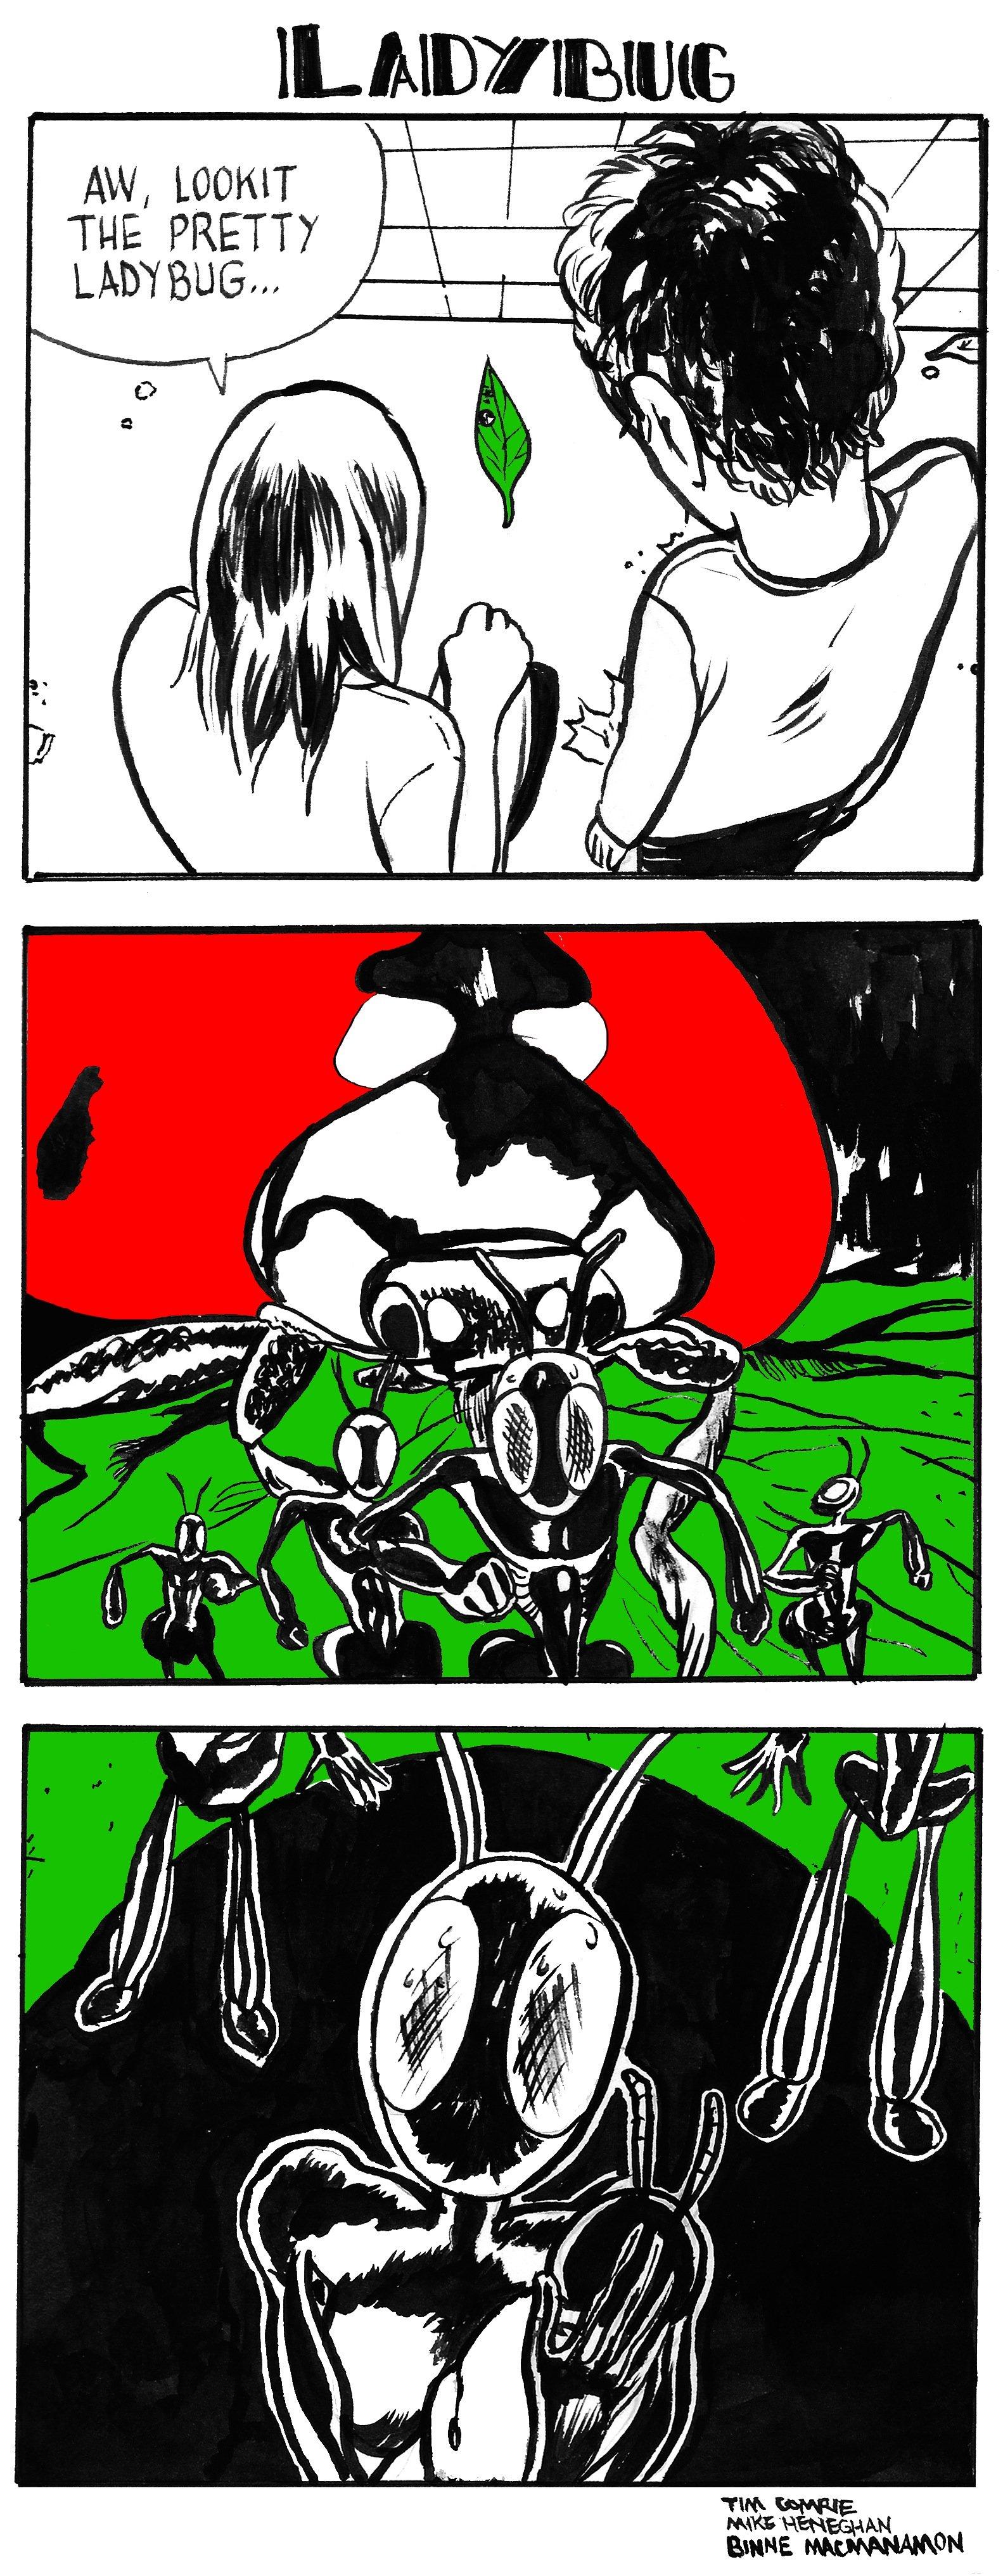 Five Hour Breakfast, Ladybug, Mike Heneghan, three box comic, humour - HeadStuff.org